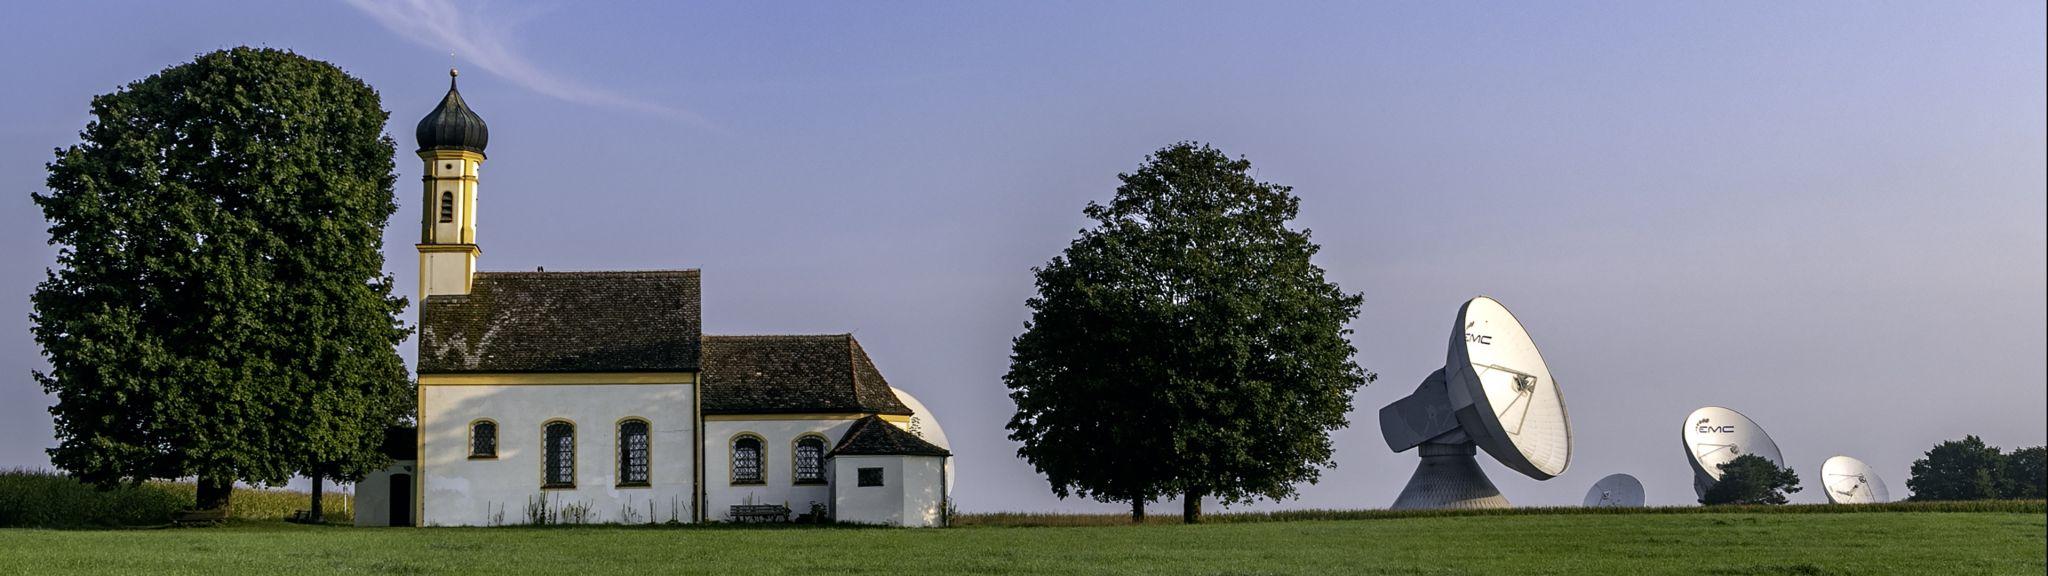 St. Johannes der Täufer, Germany